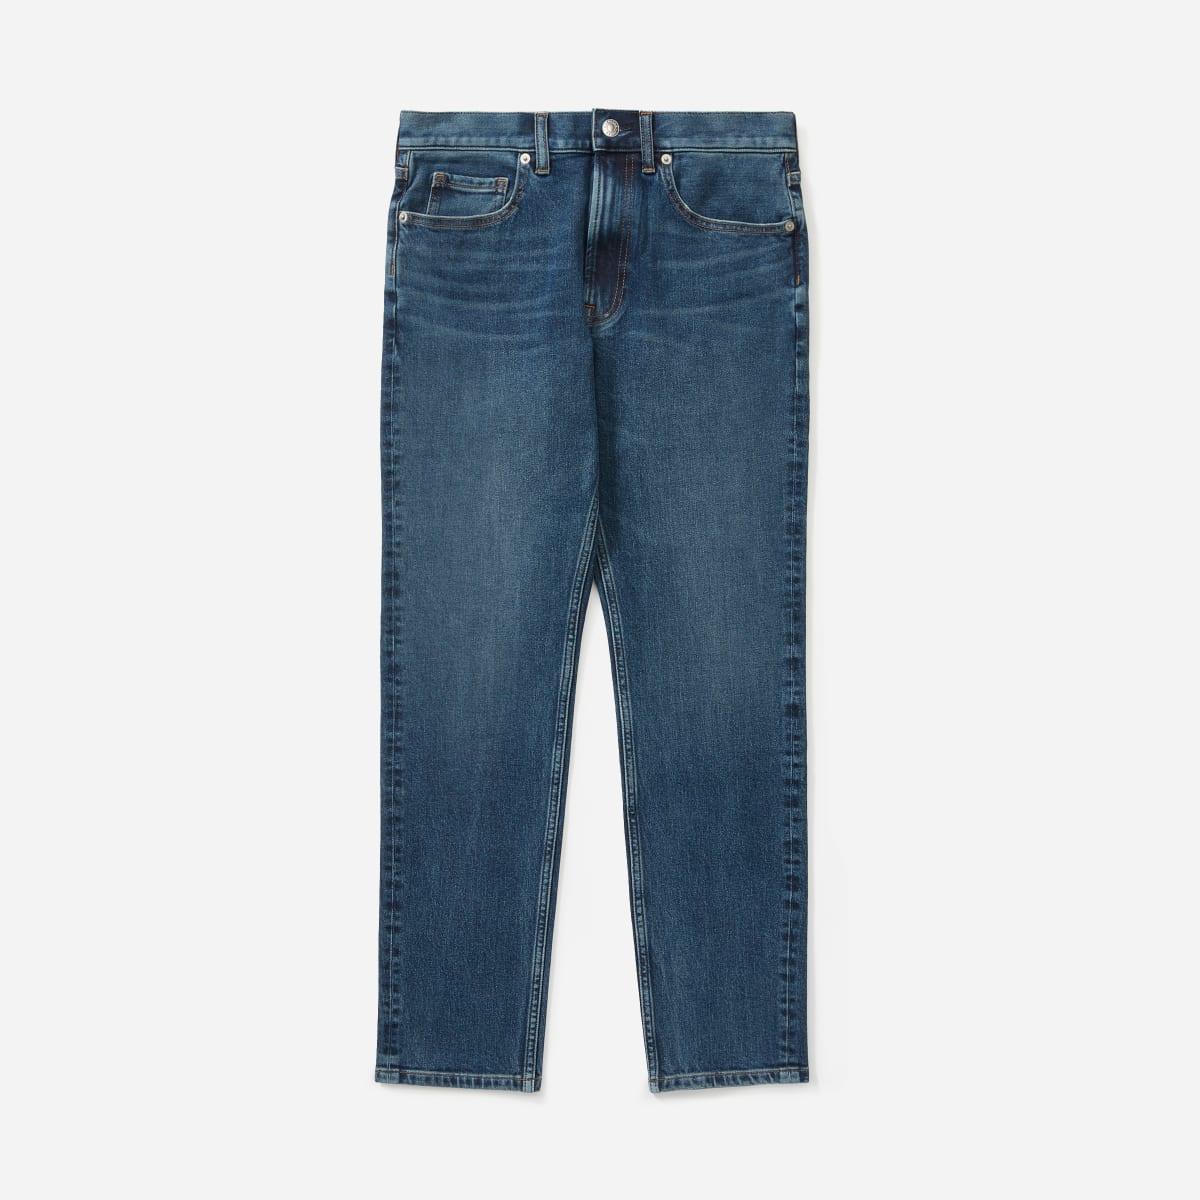 Everlane Organic Jeans